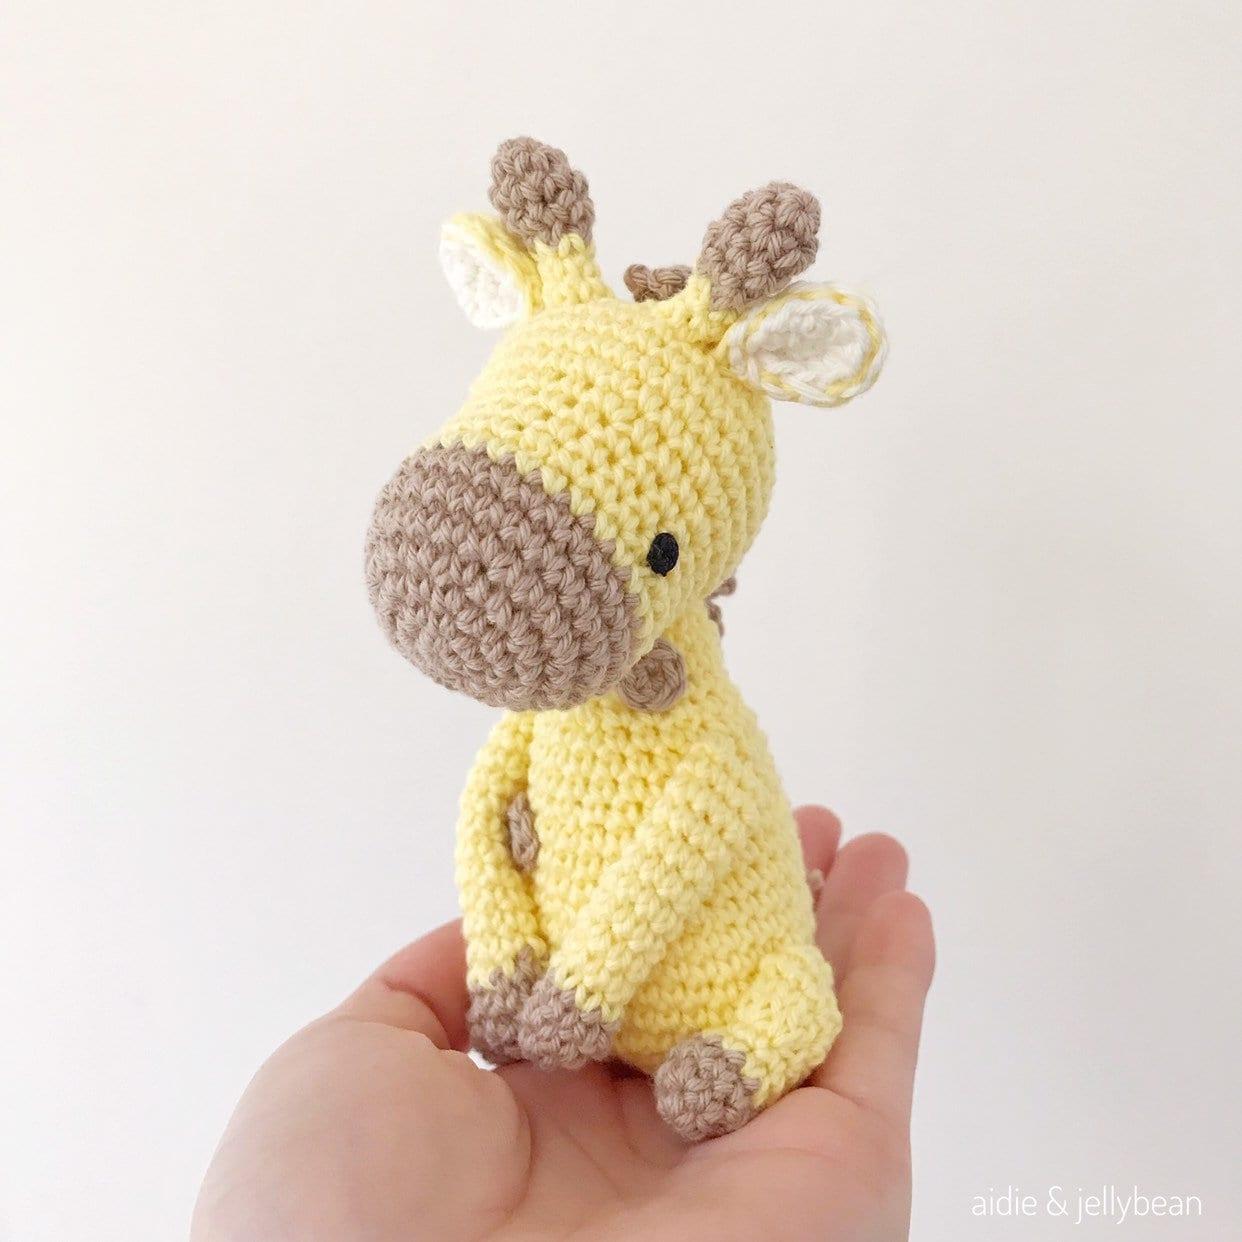 Giraffe Crochet Patterns -Amigurumi Tips - A More Crafty Life | 1242x1242